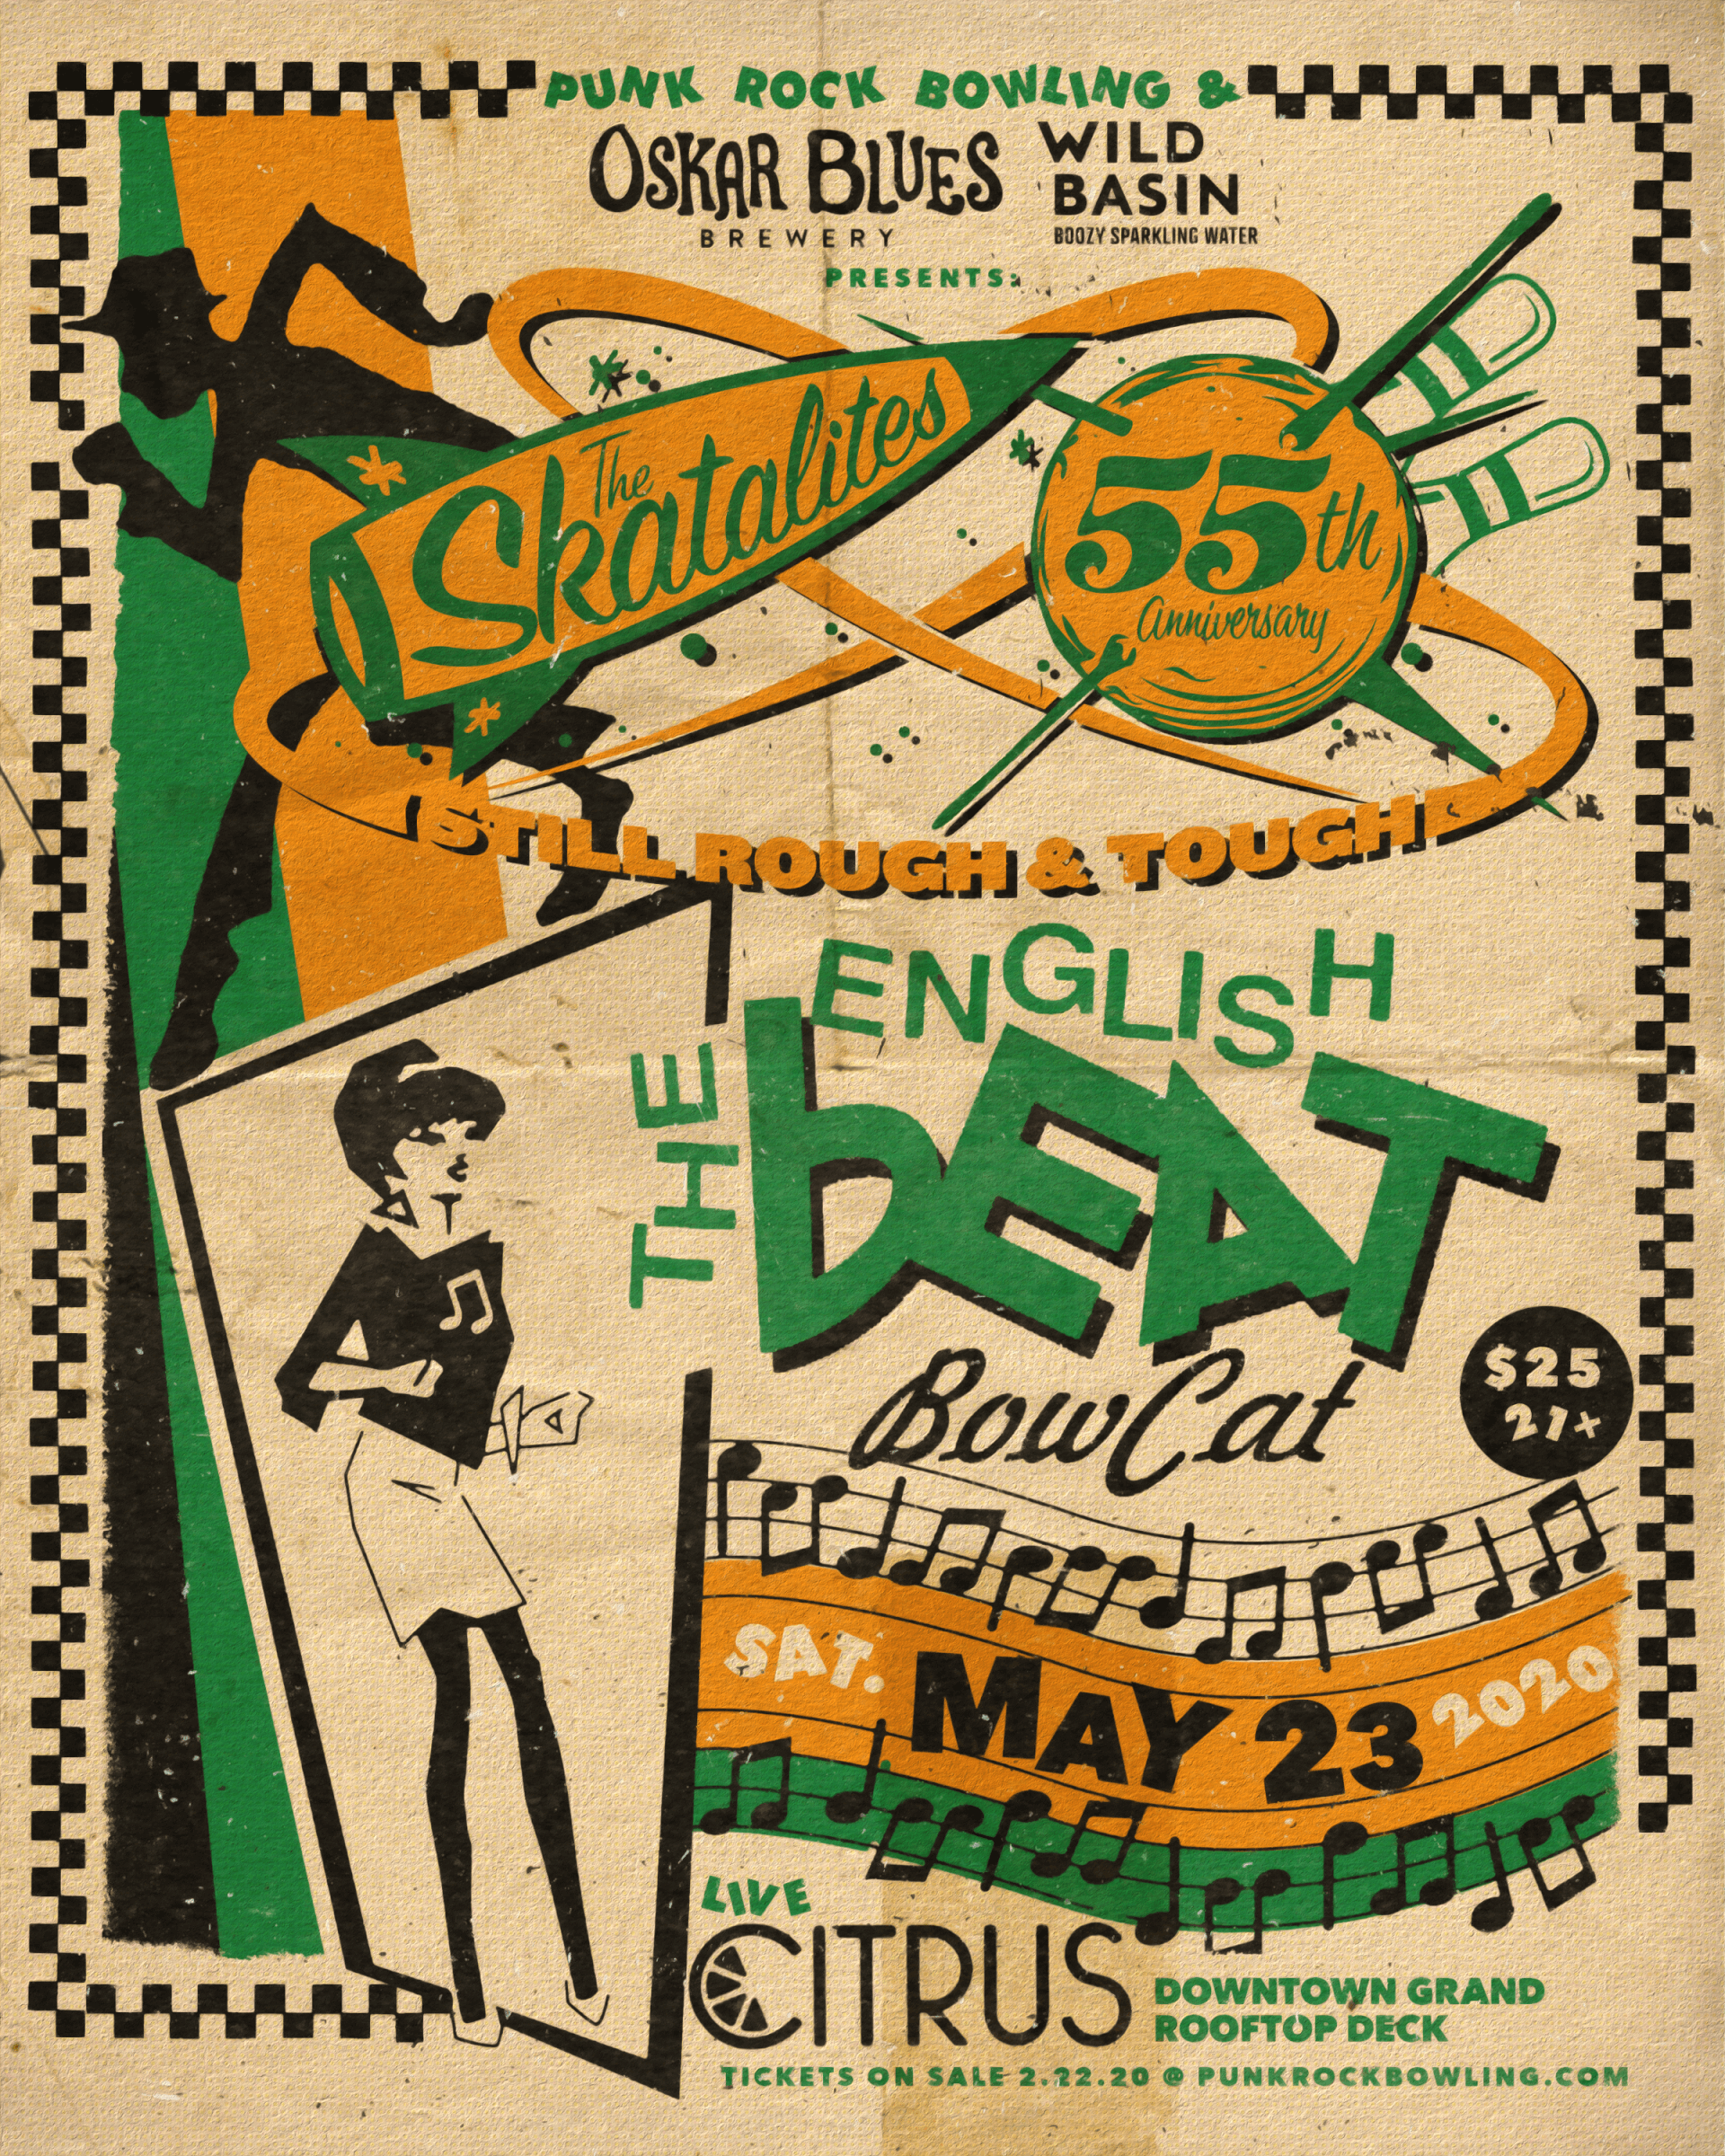 The Skatalites English Beat Punk Rock Bowling 2020 Las Vegas